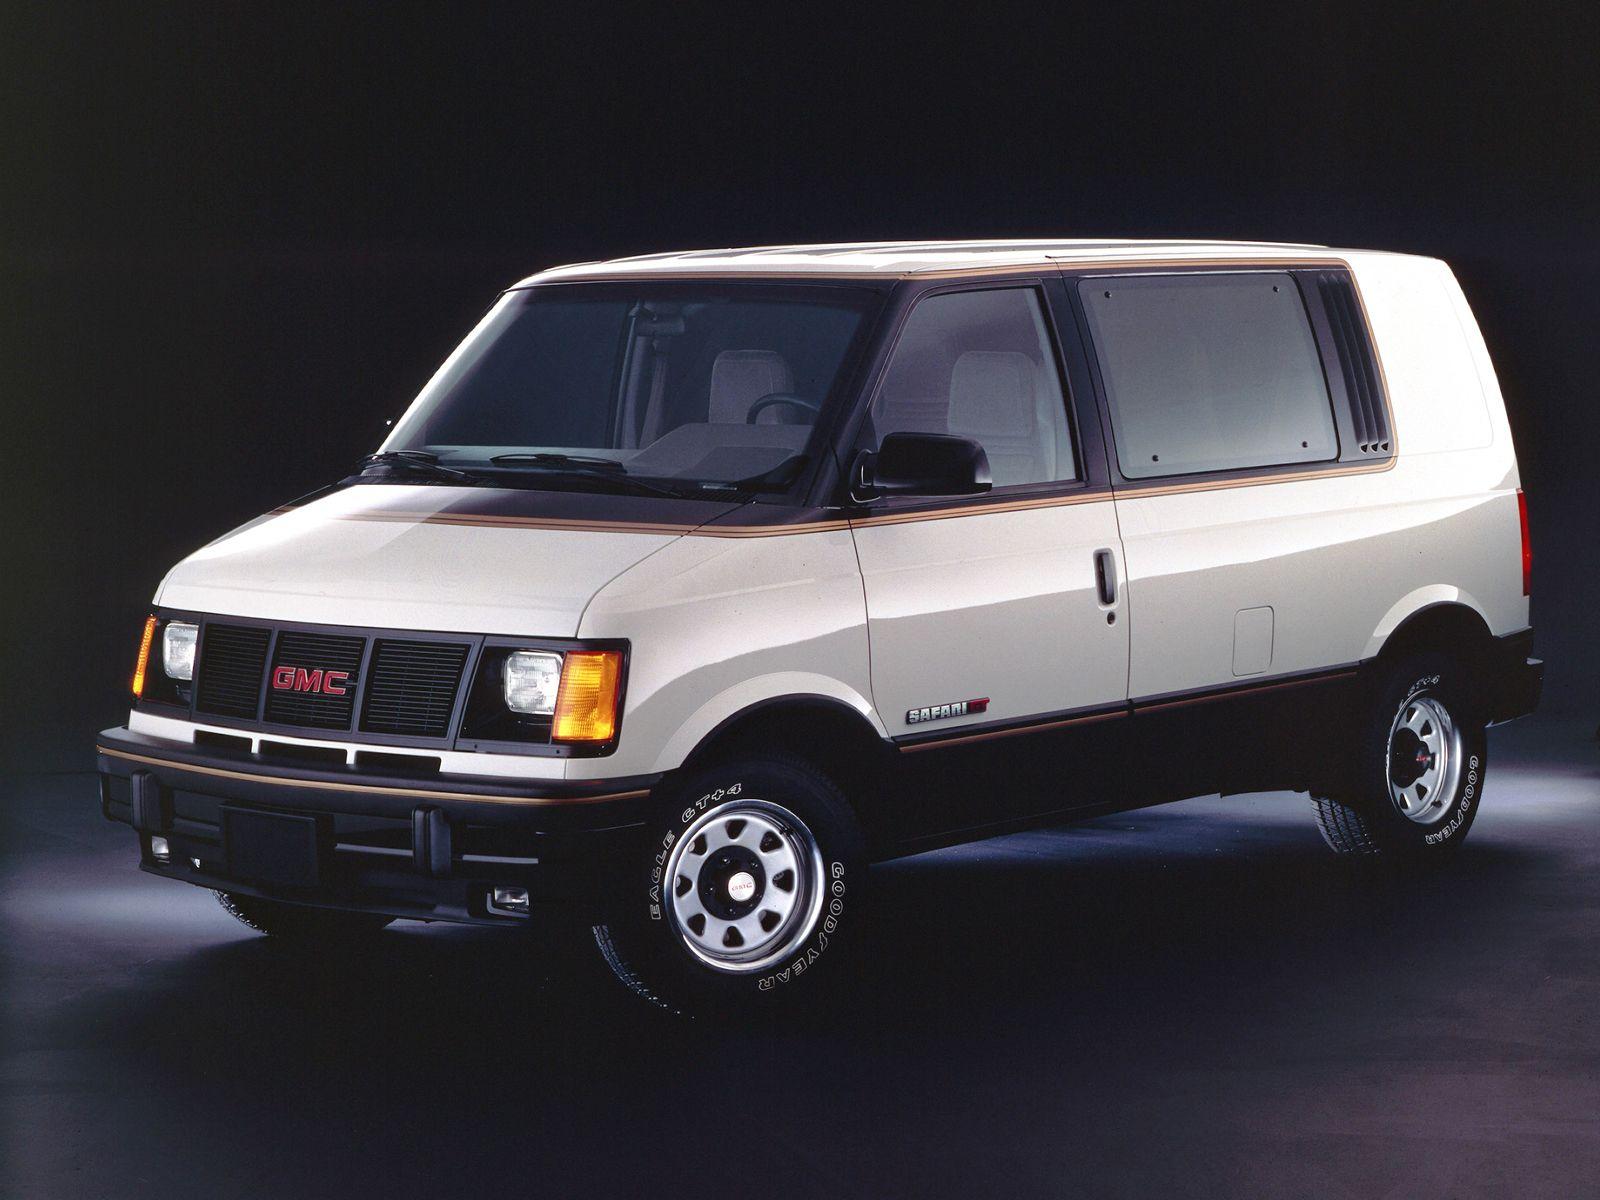 1990 94 gmc safari gt pistons pinterest general motors cars and gmc trucks. Black Bedroom Furniture Sets. Home Design Ideas